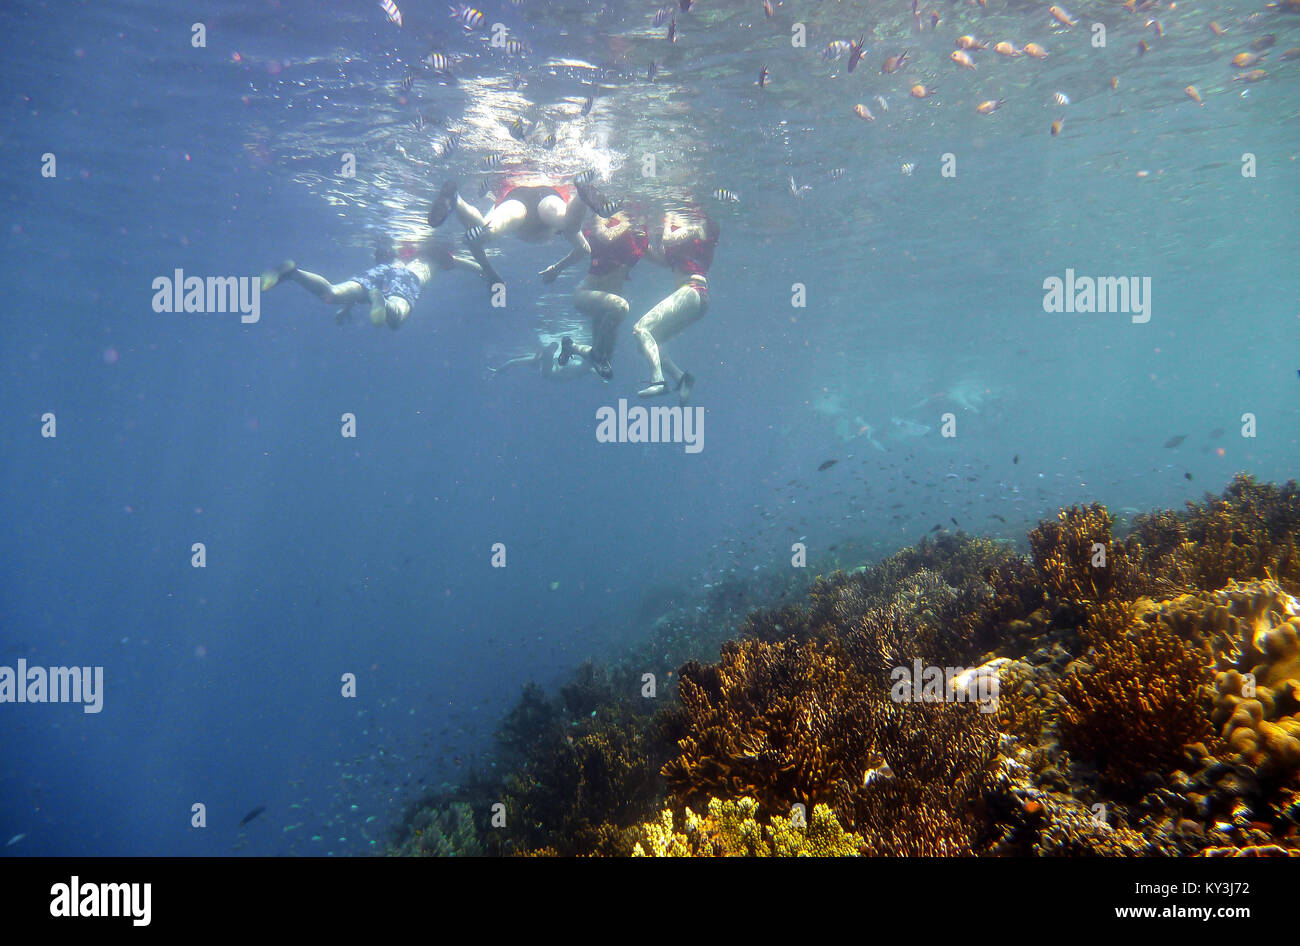 Diving and snorkeling in Menjangan island in west side of Bali. - Stock Image